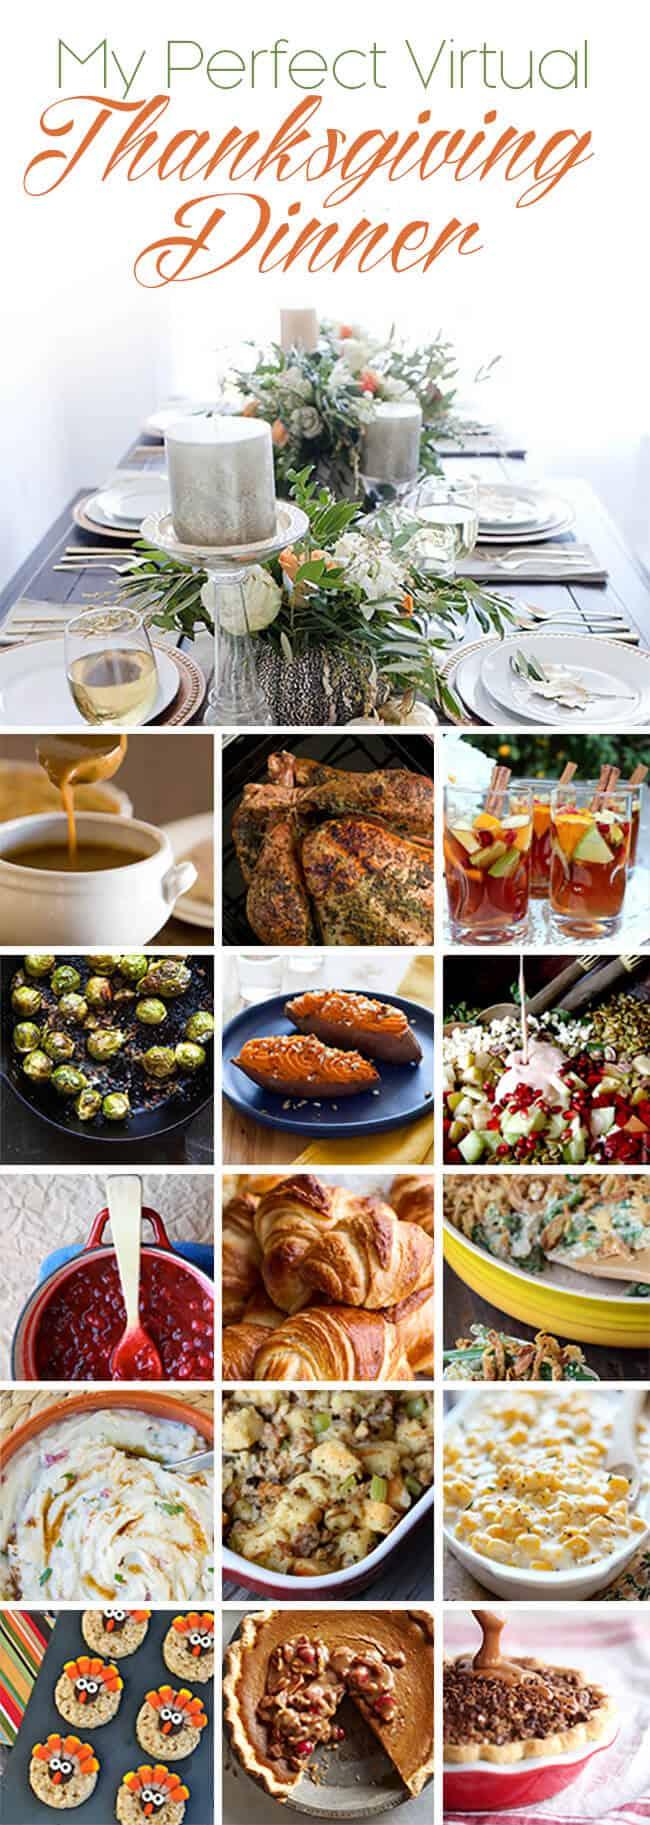 Virtual Thanksgiving Ideas2